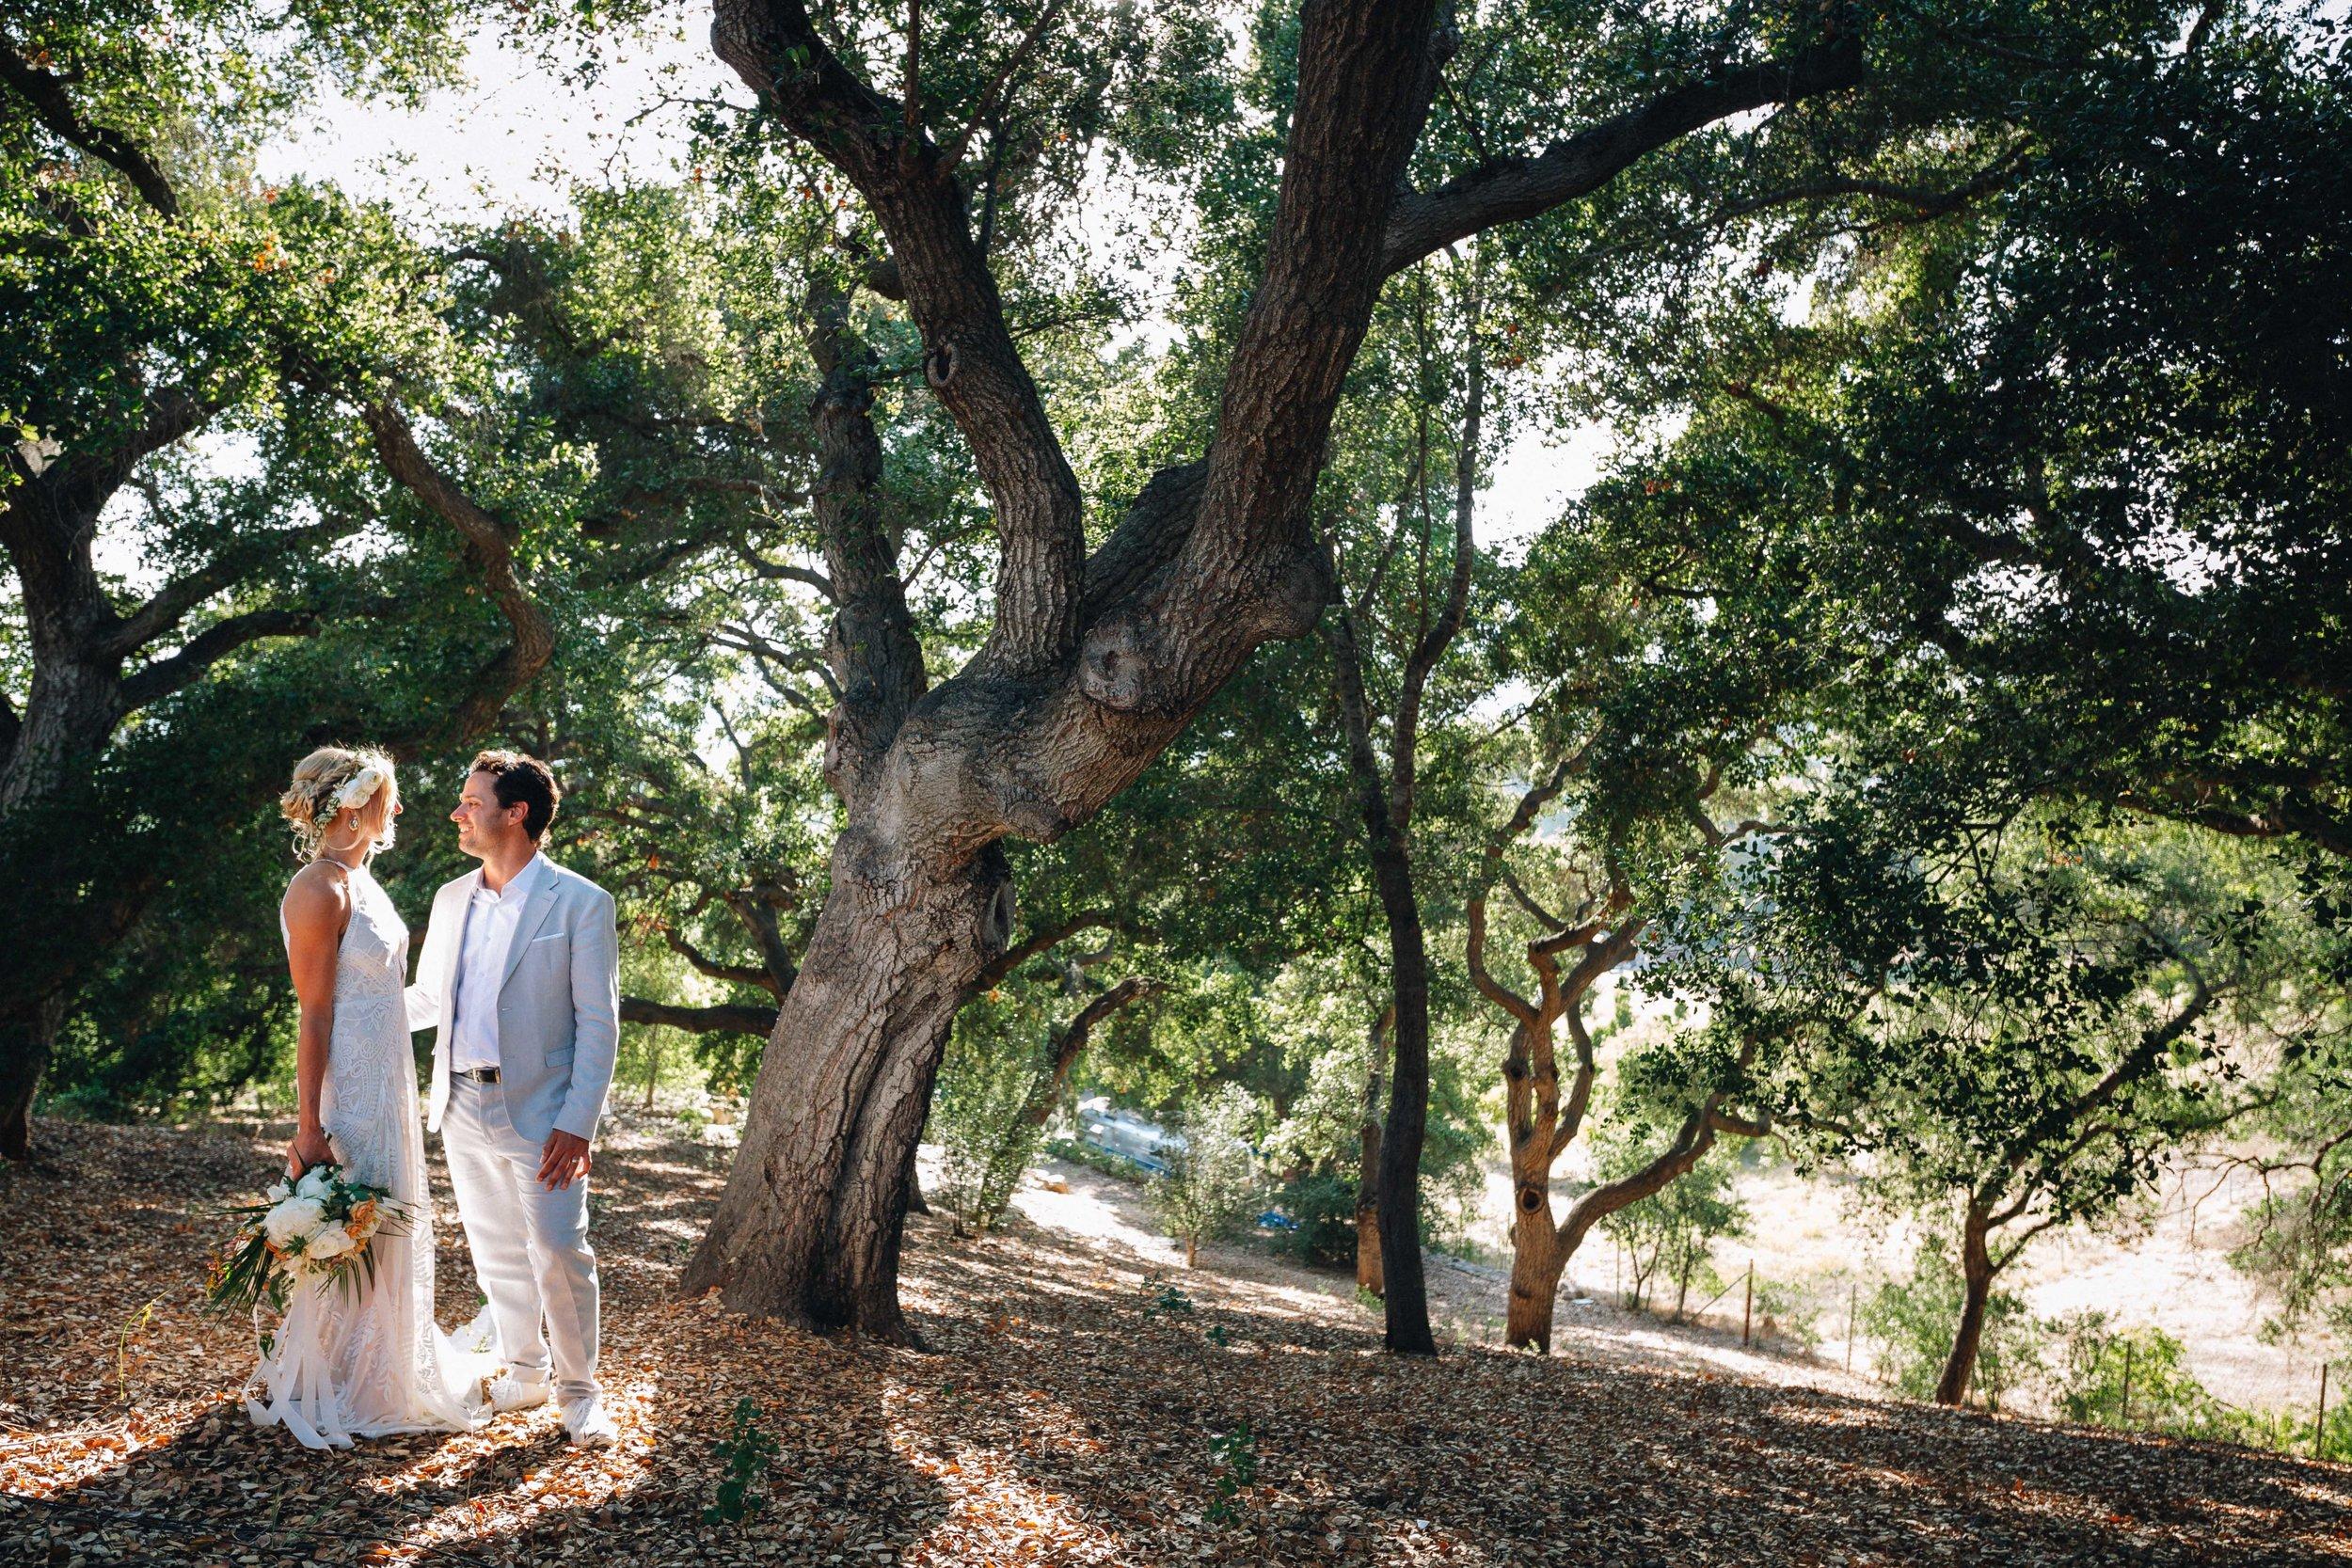 Whitney-Matt-wedding-Two Penguin Photography - Forage Ojai-137A0153.jpg